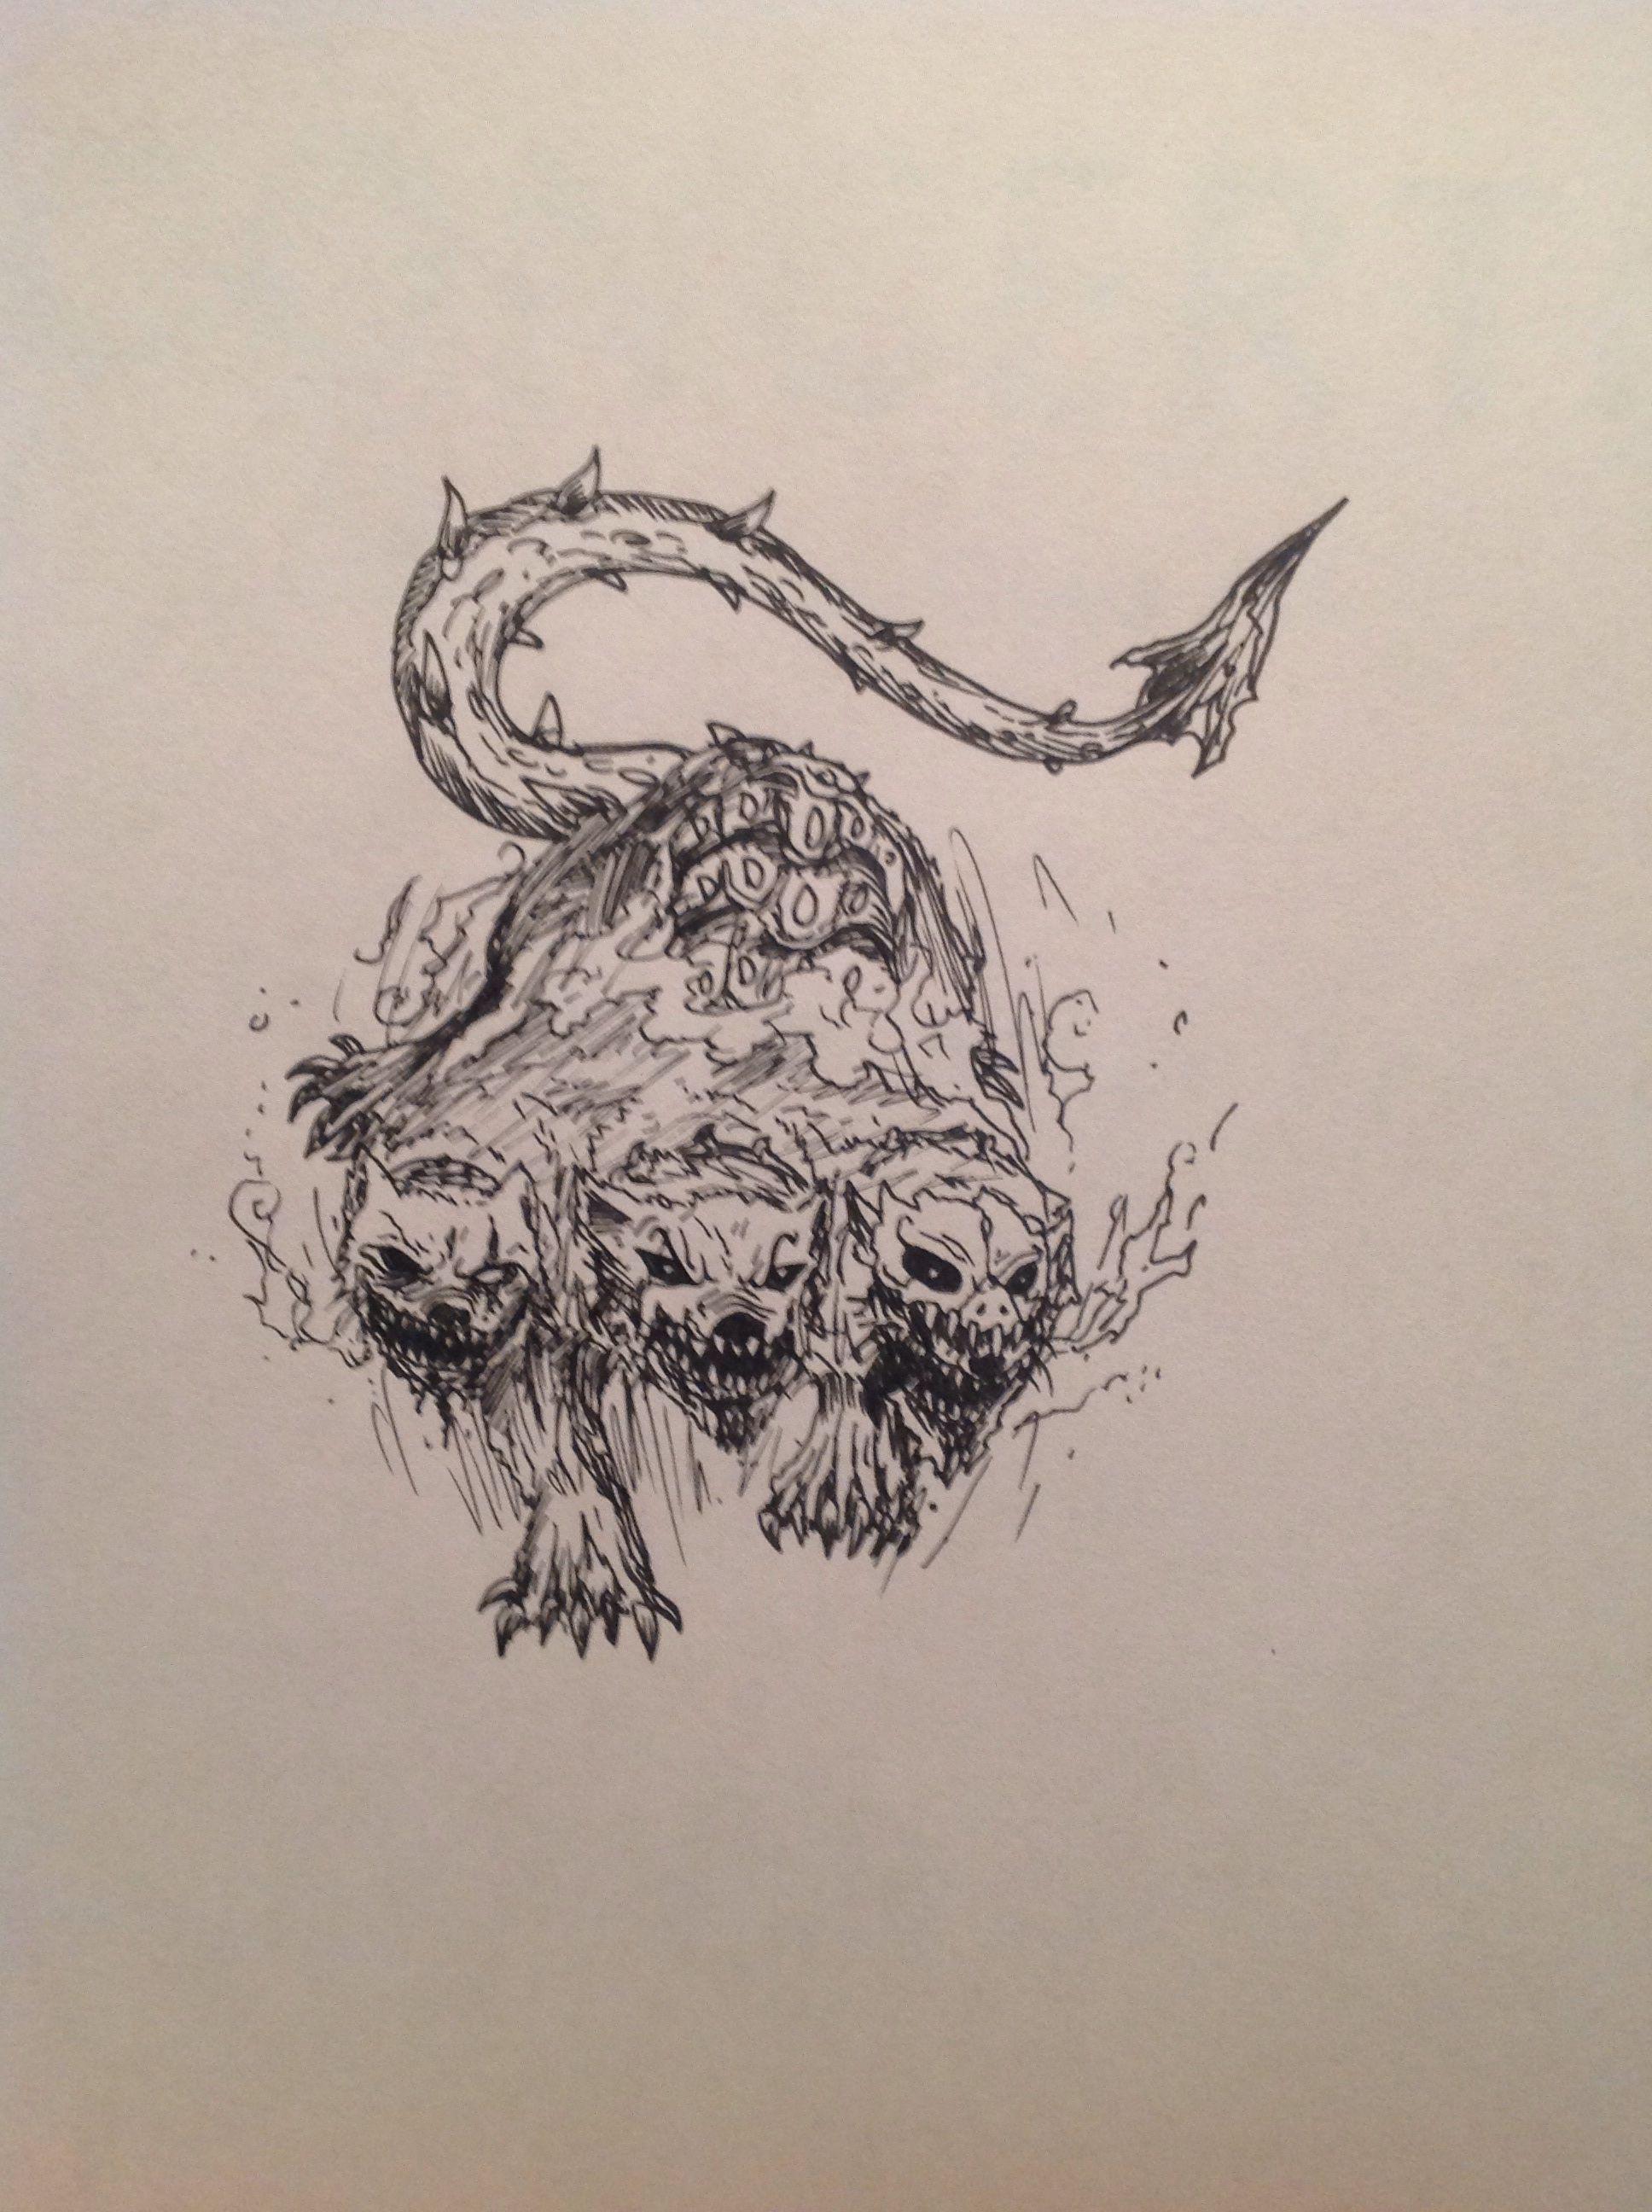 Cerberus The Three Headed Hellhound Hellhound Tattoo Mythology Tattoos Best Sleeve Tattoos [ 2592 x 1936 Pixel ]